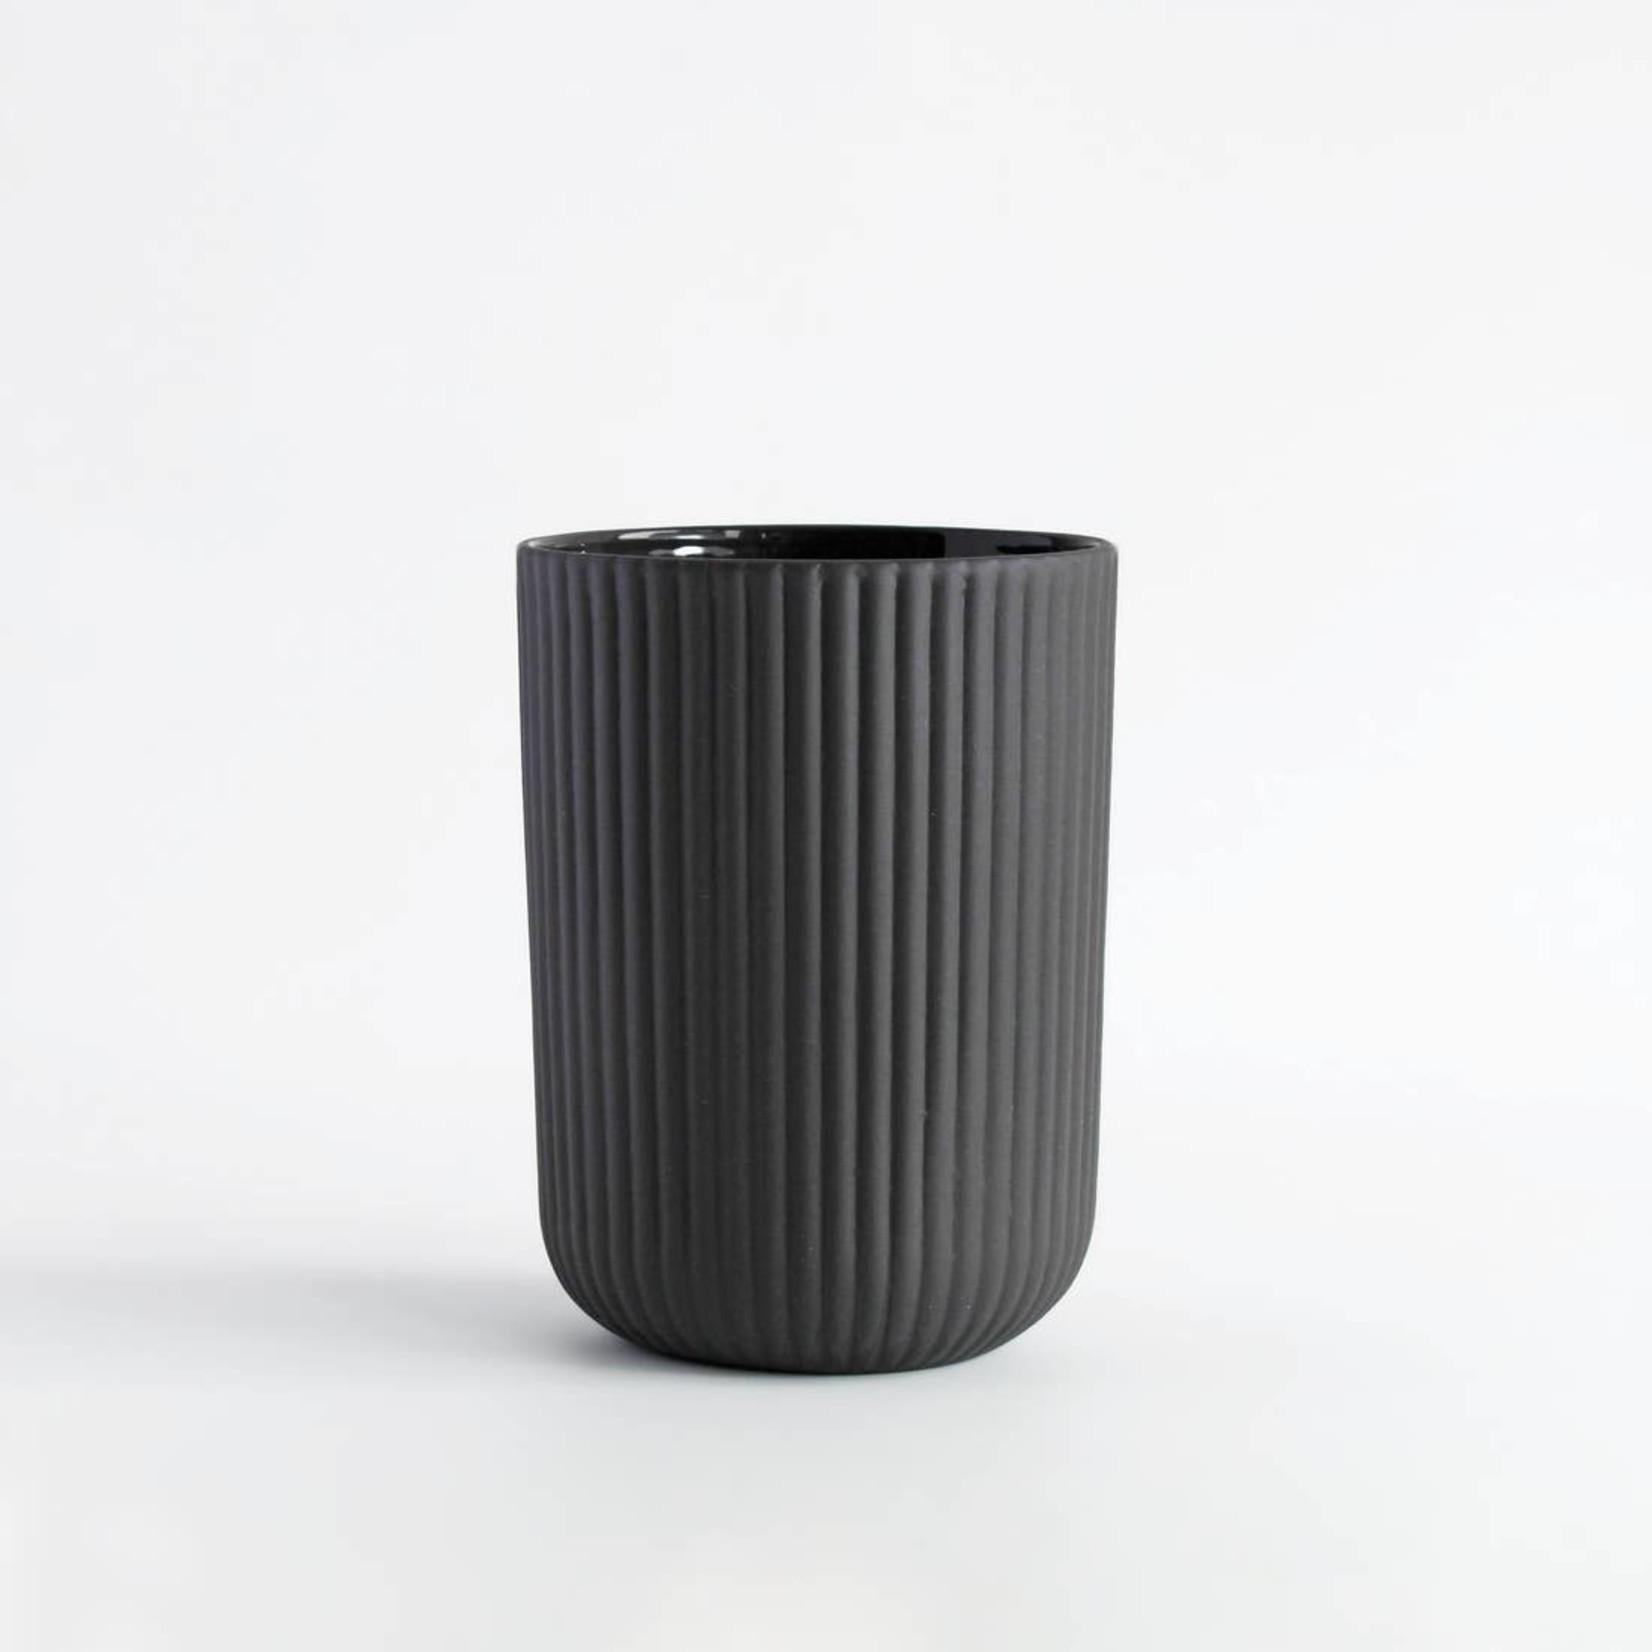 Archive Studio Archive Studio Handmade Coffee Cup Ribbed Dark Grey